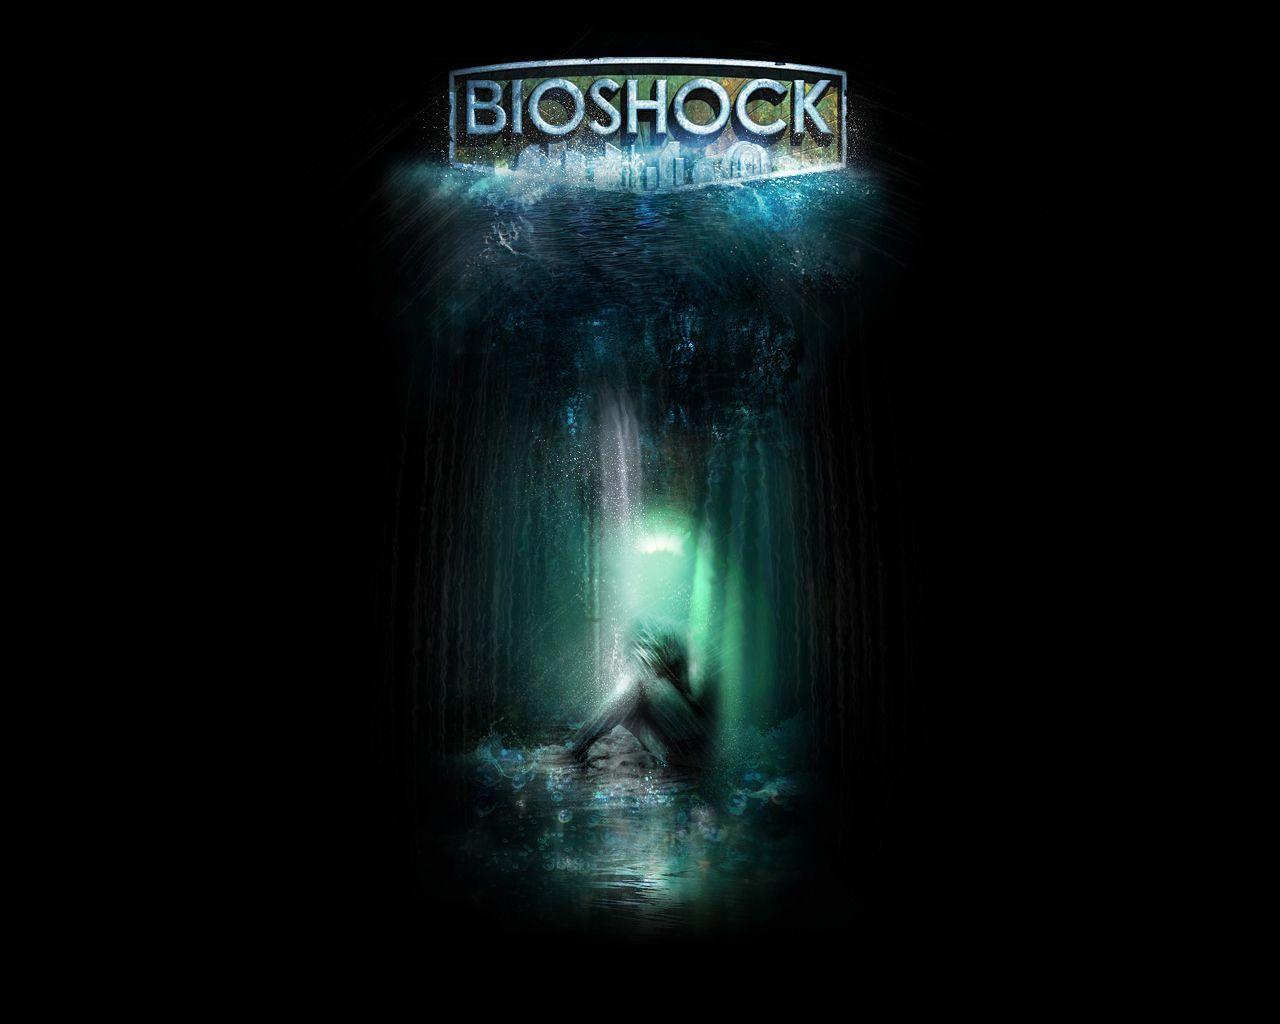 Bioshocks Rapture By Tim Warnock Wallpapers Bioshock Bioshock Rapture Bioshock Game